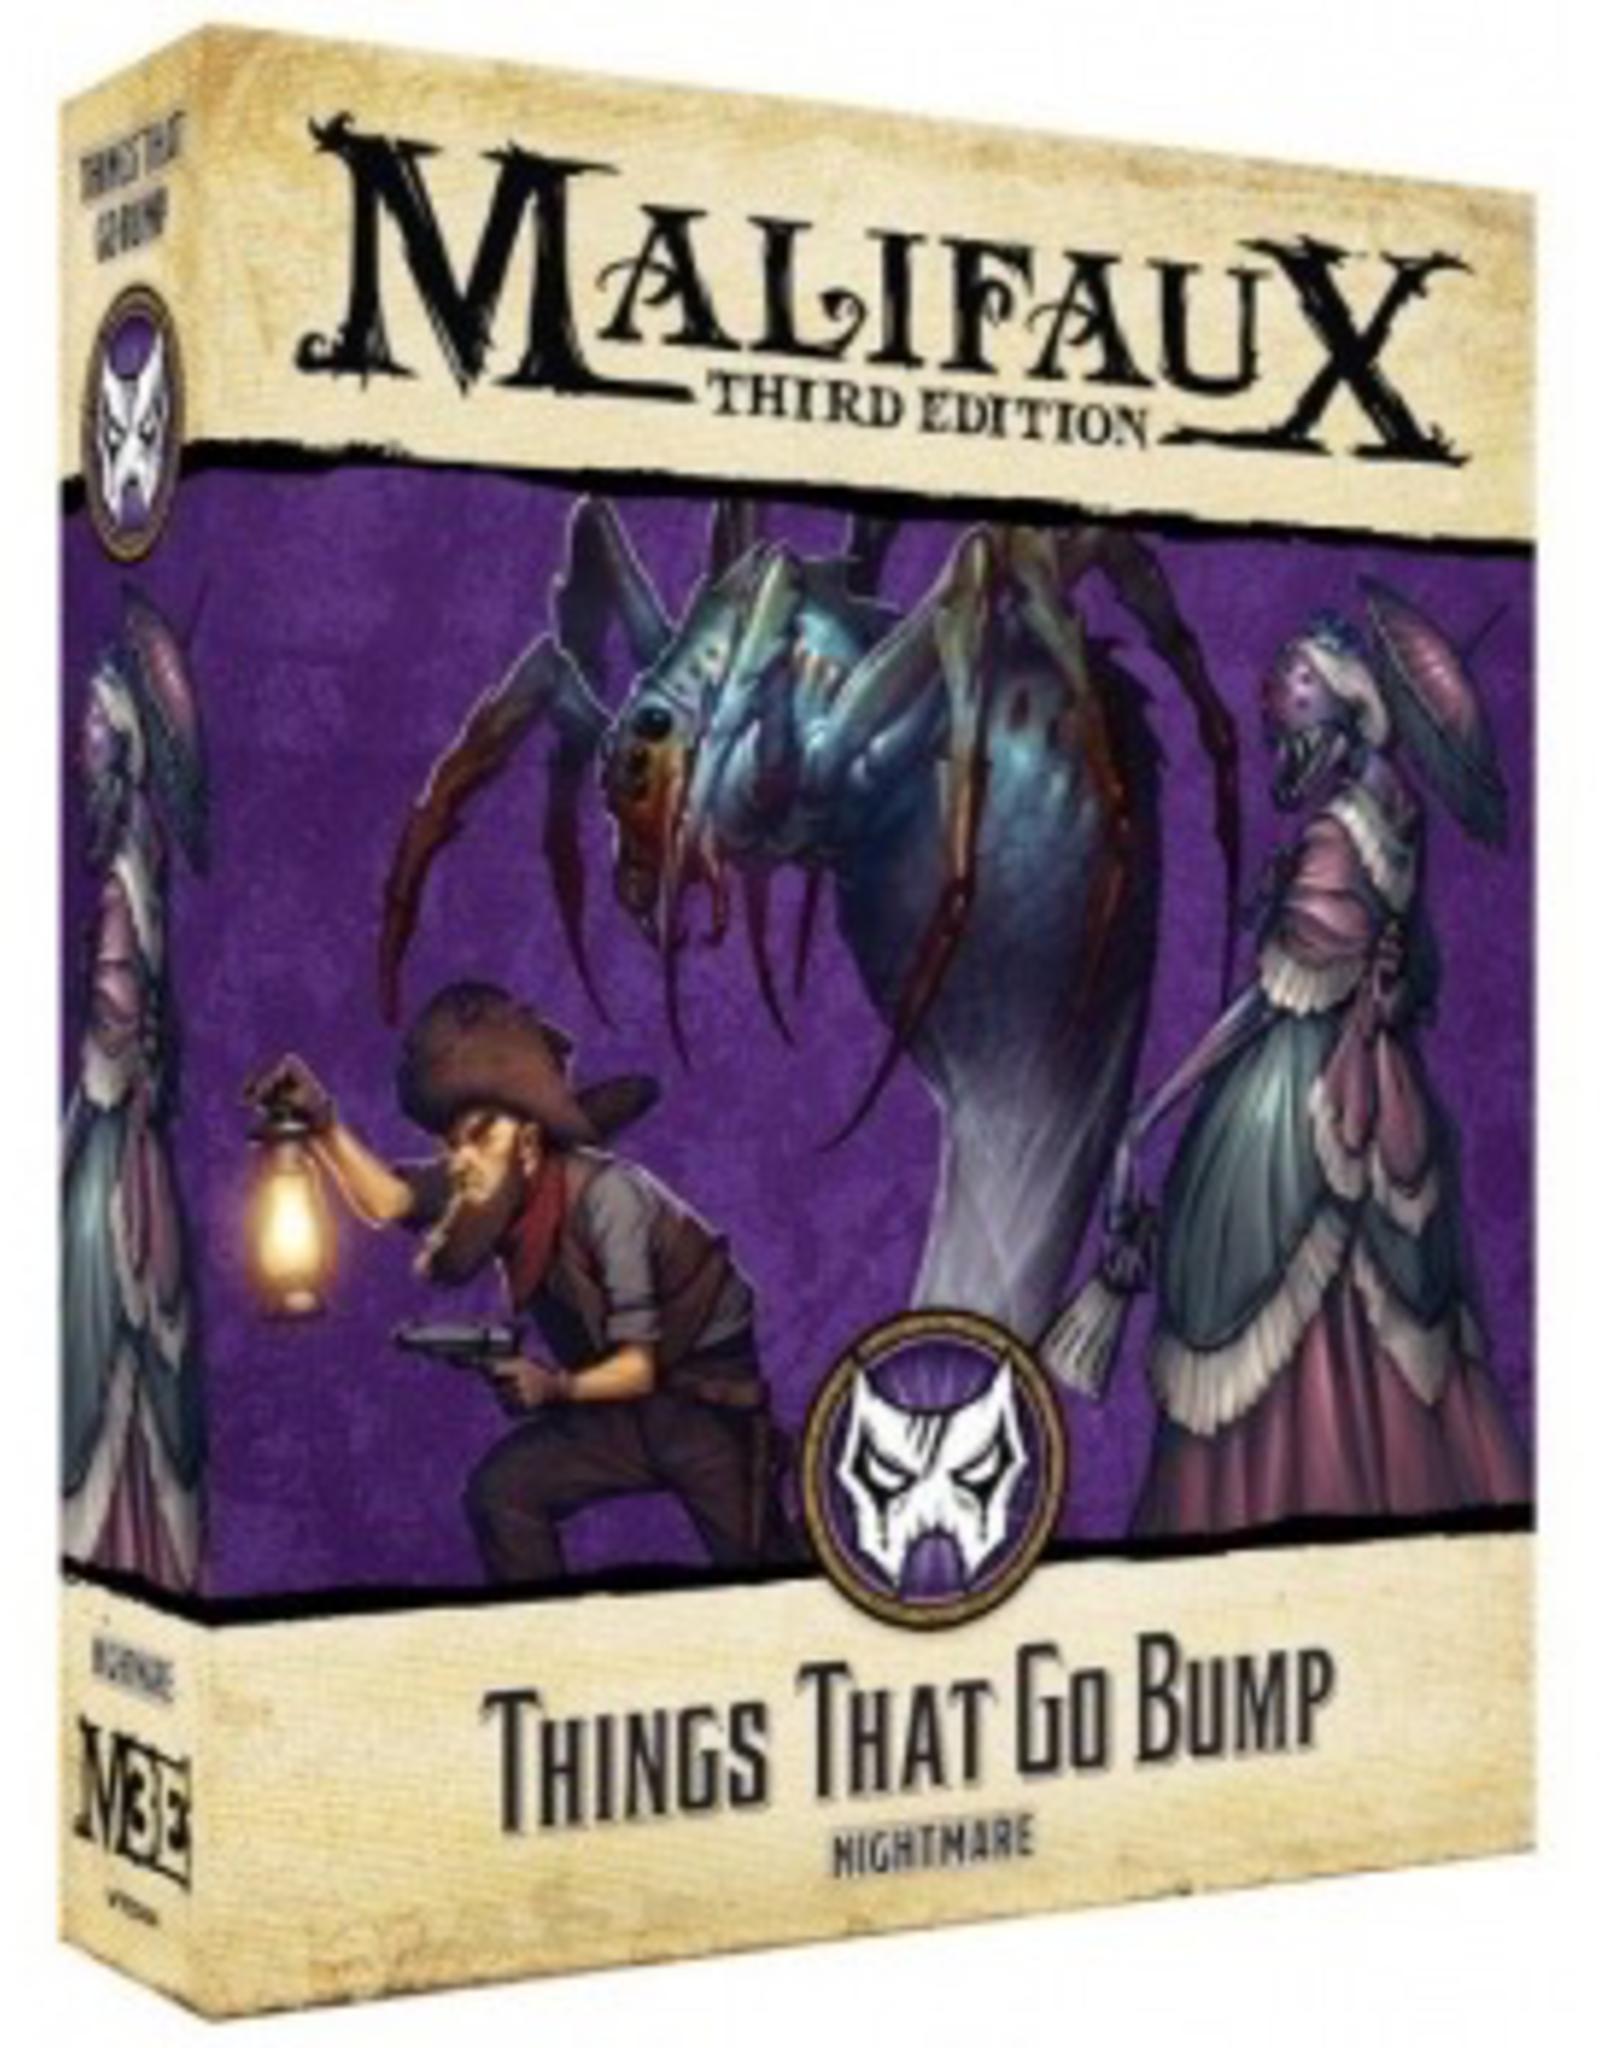 WYR - Malifaux Miniaturen Malifaux 3rd Edition - Things that Go Bump - EN